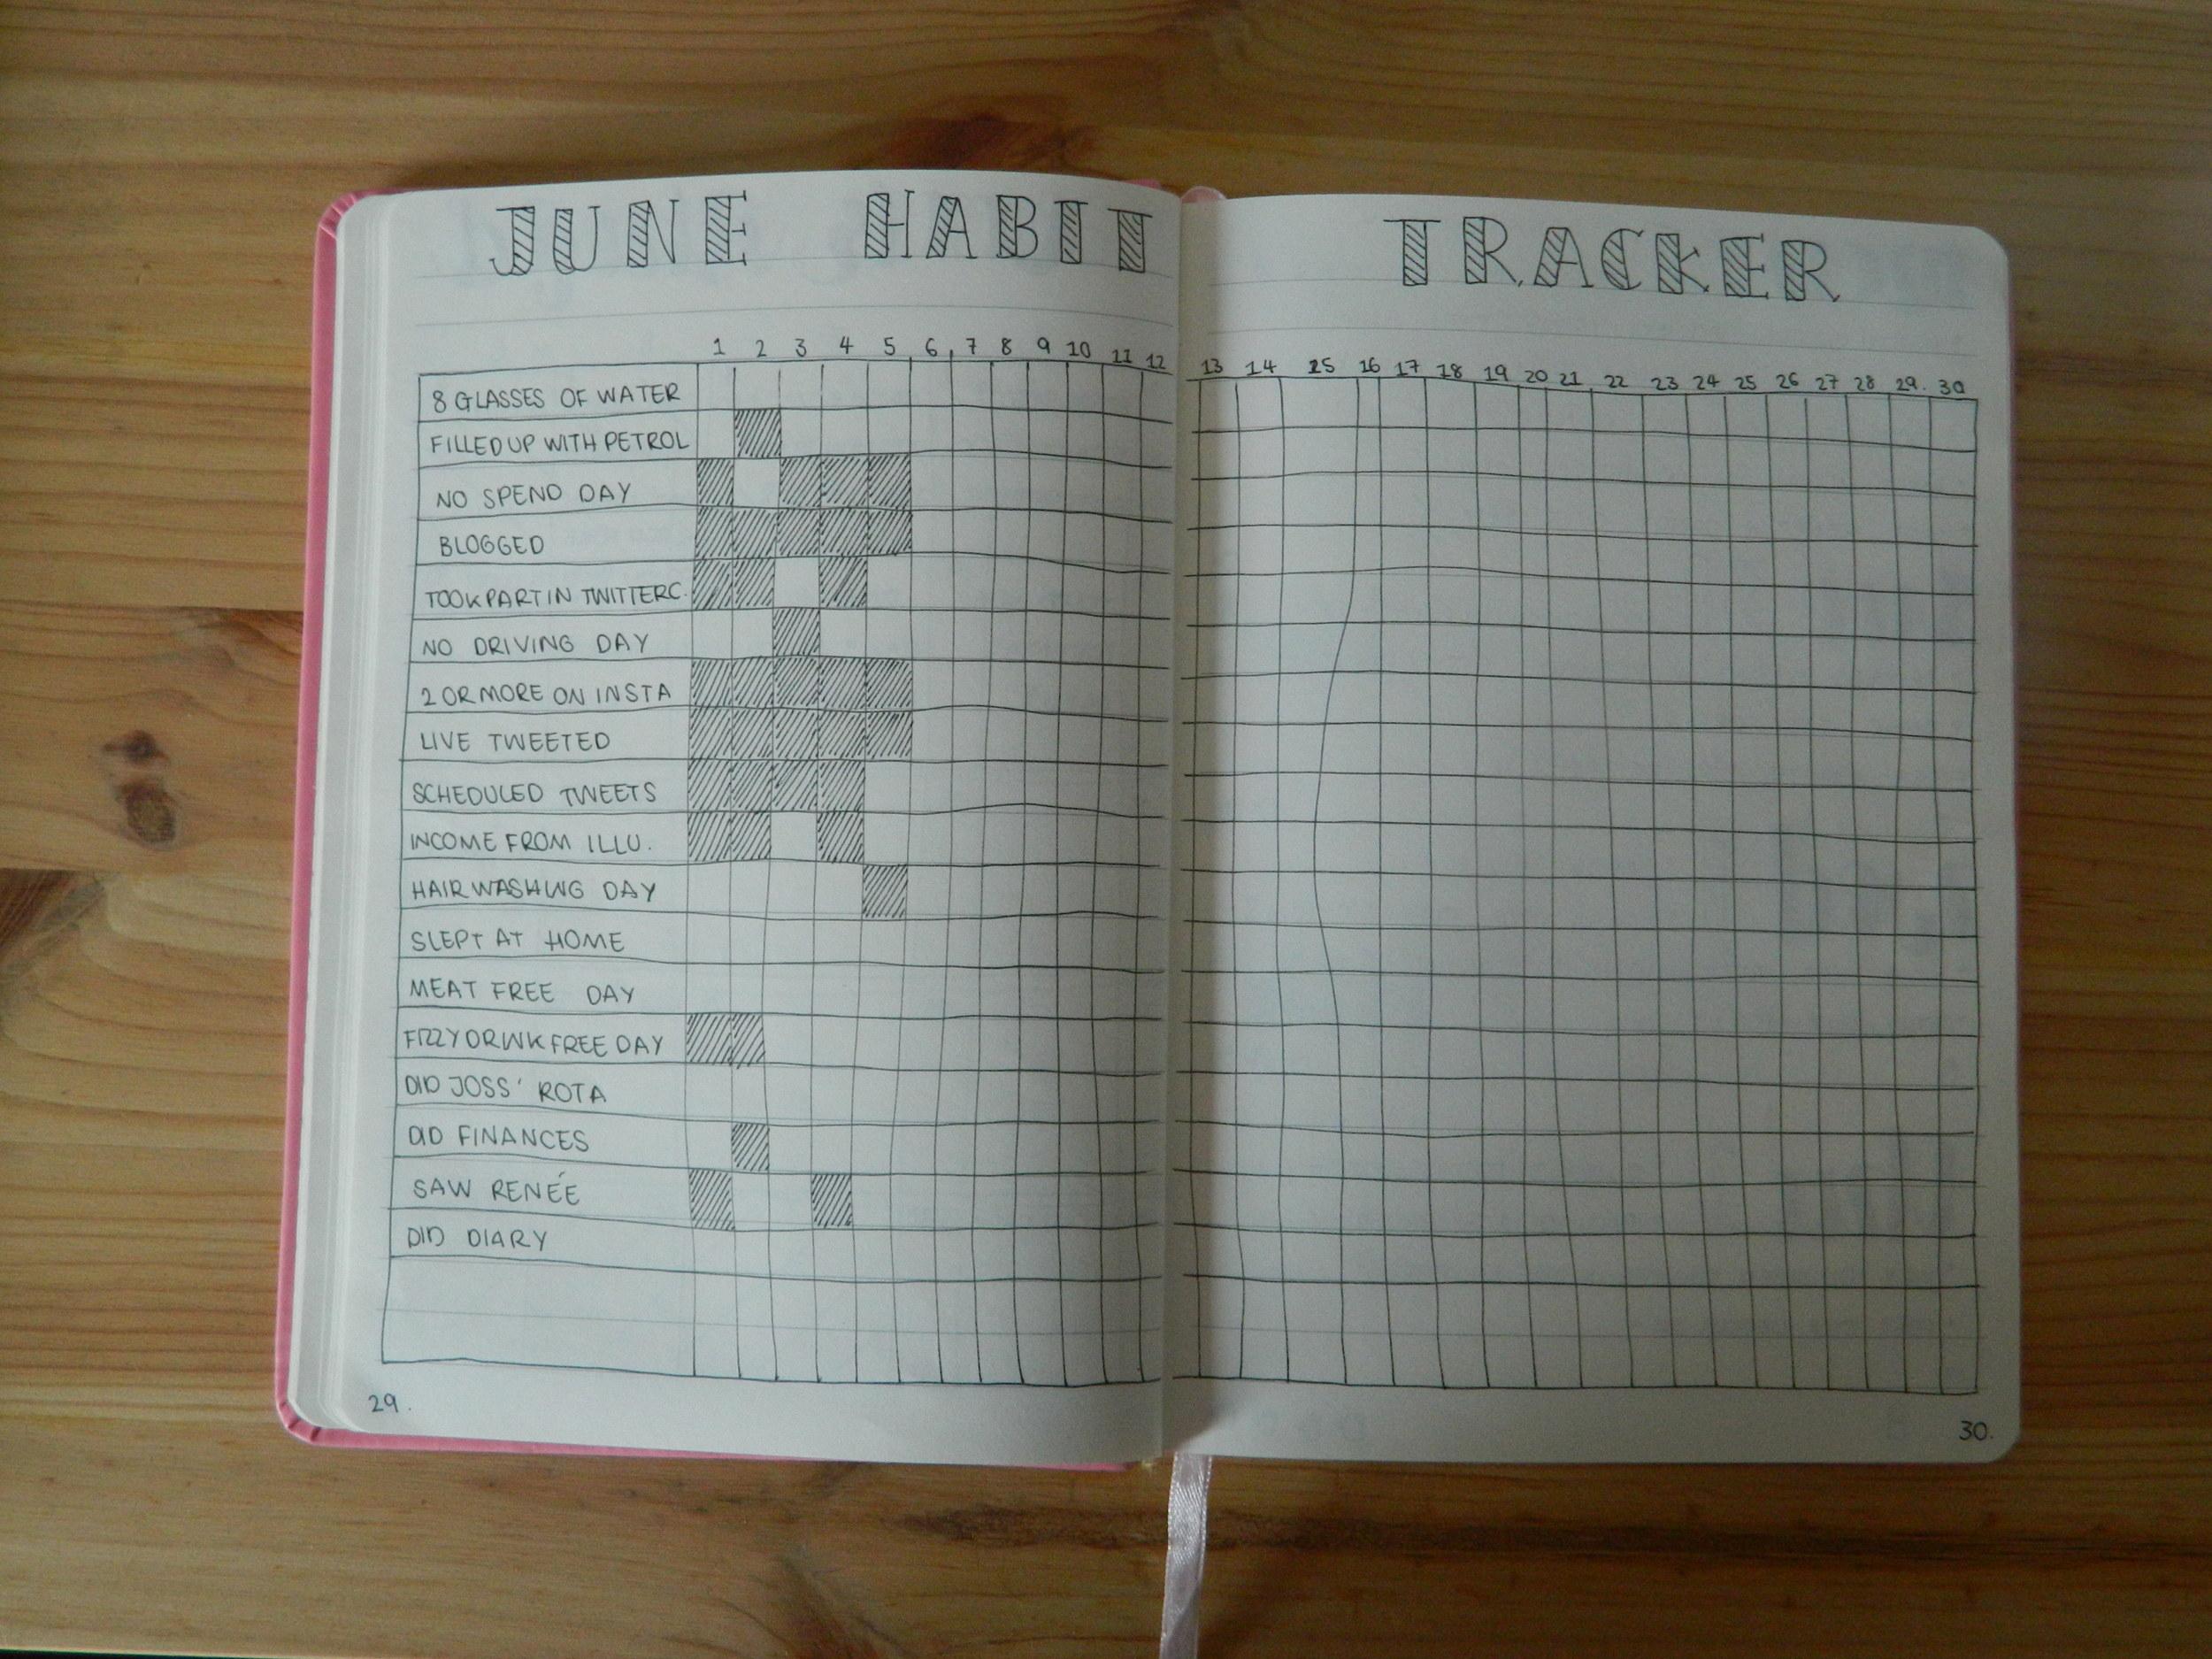 June habit tracker.